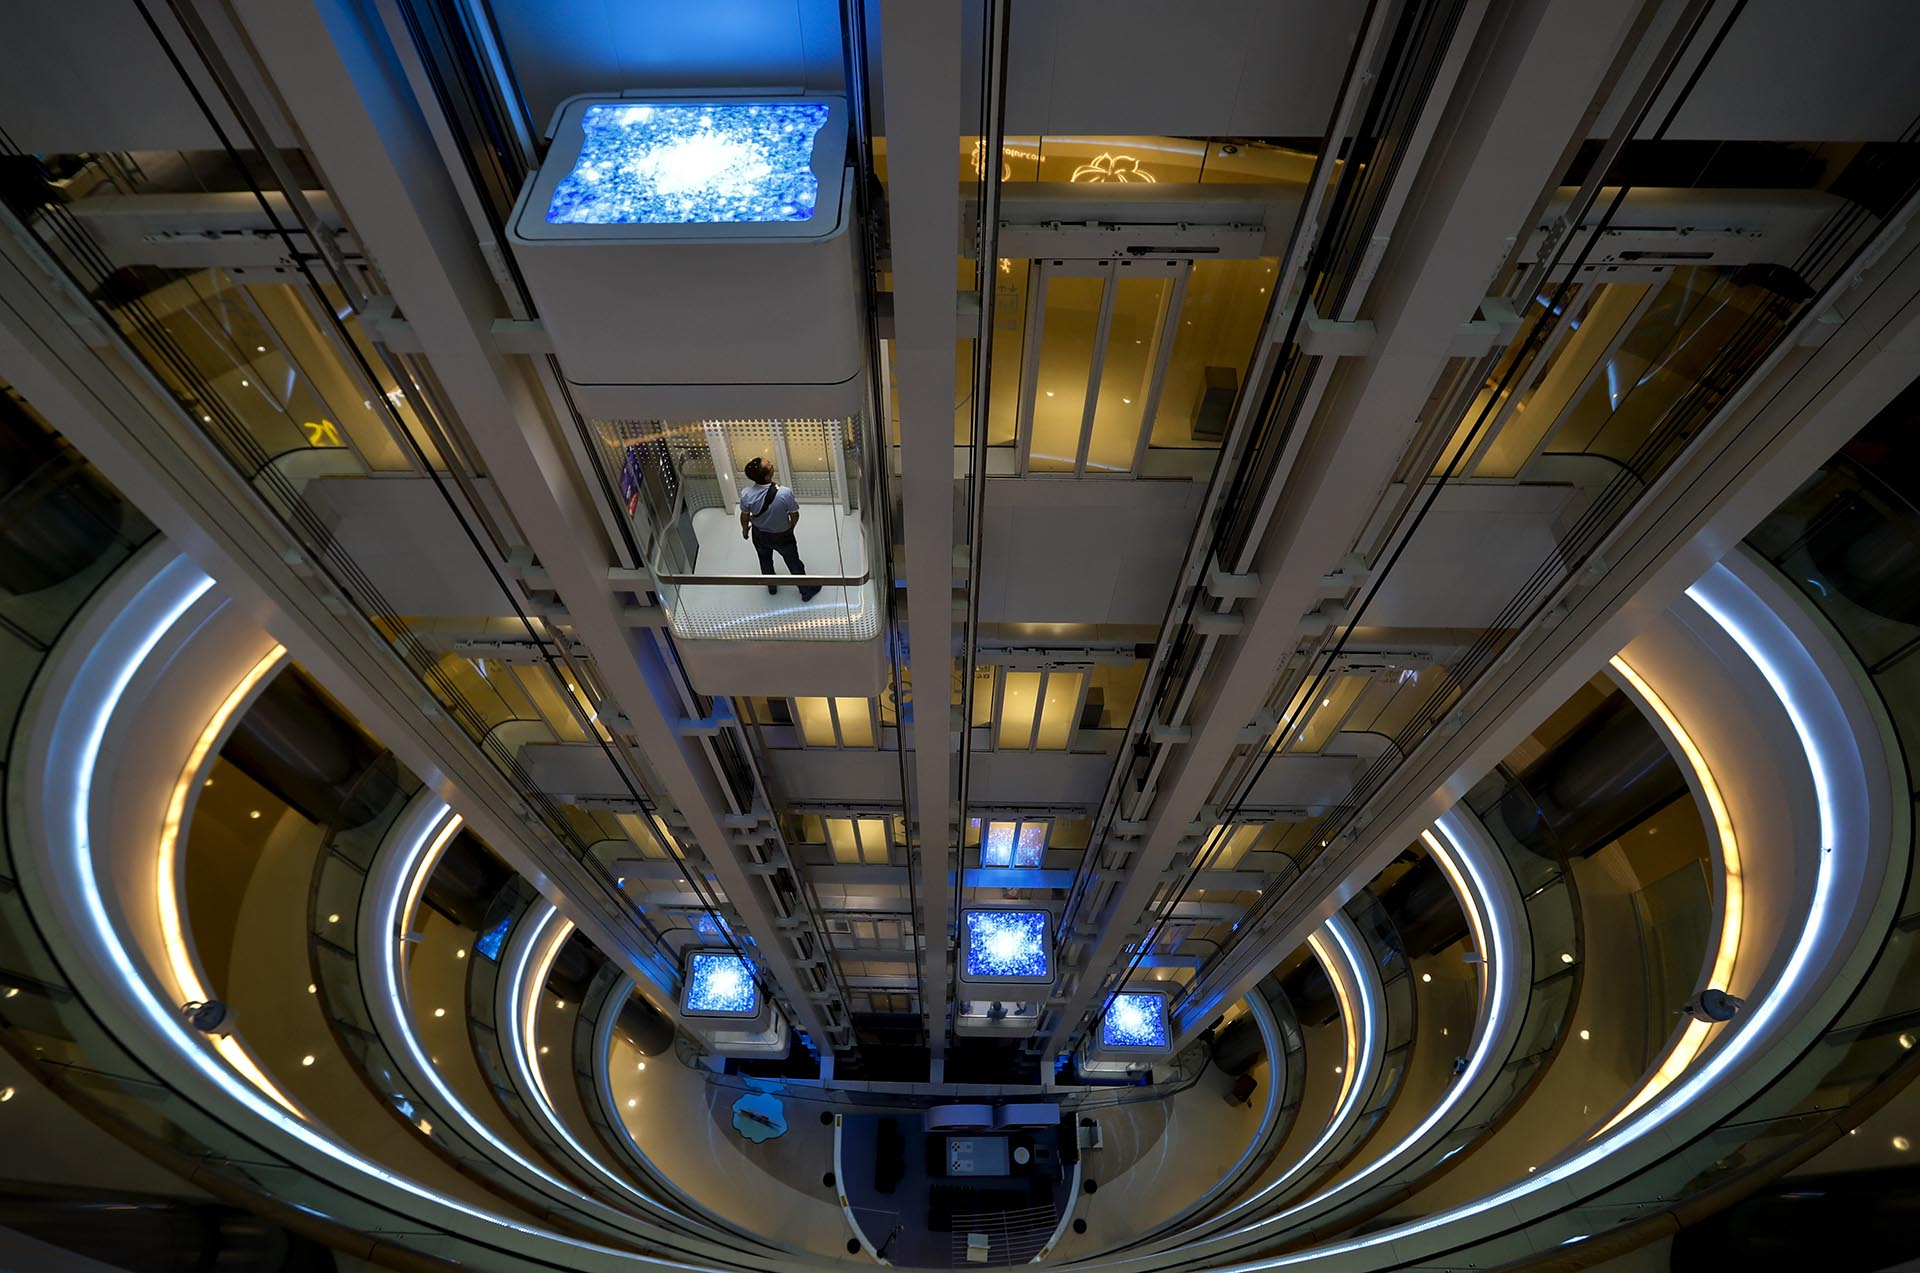 Un hombre toma un ascensor en un centro comercial gigante recién abierto en Pekín